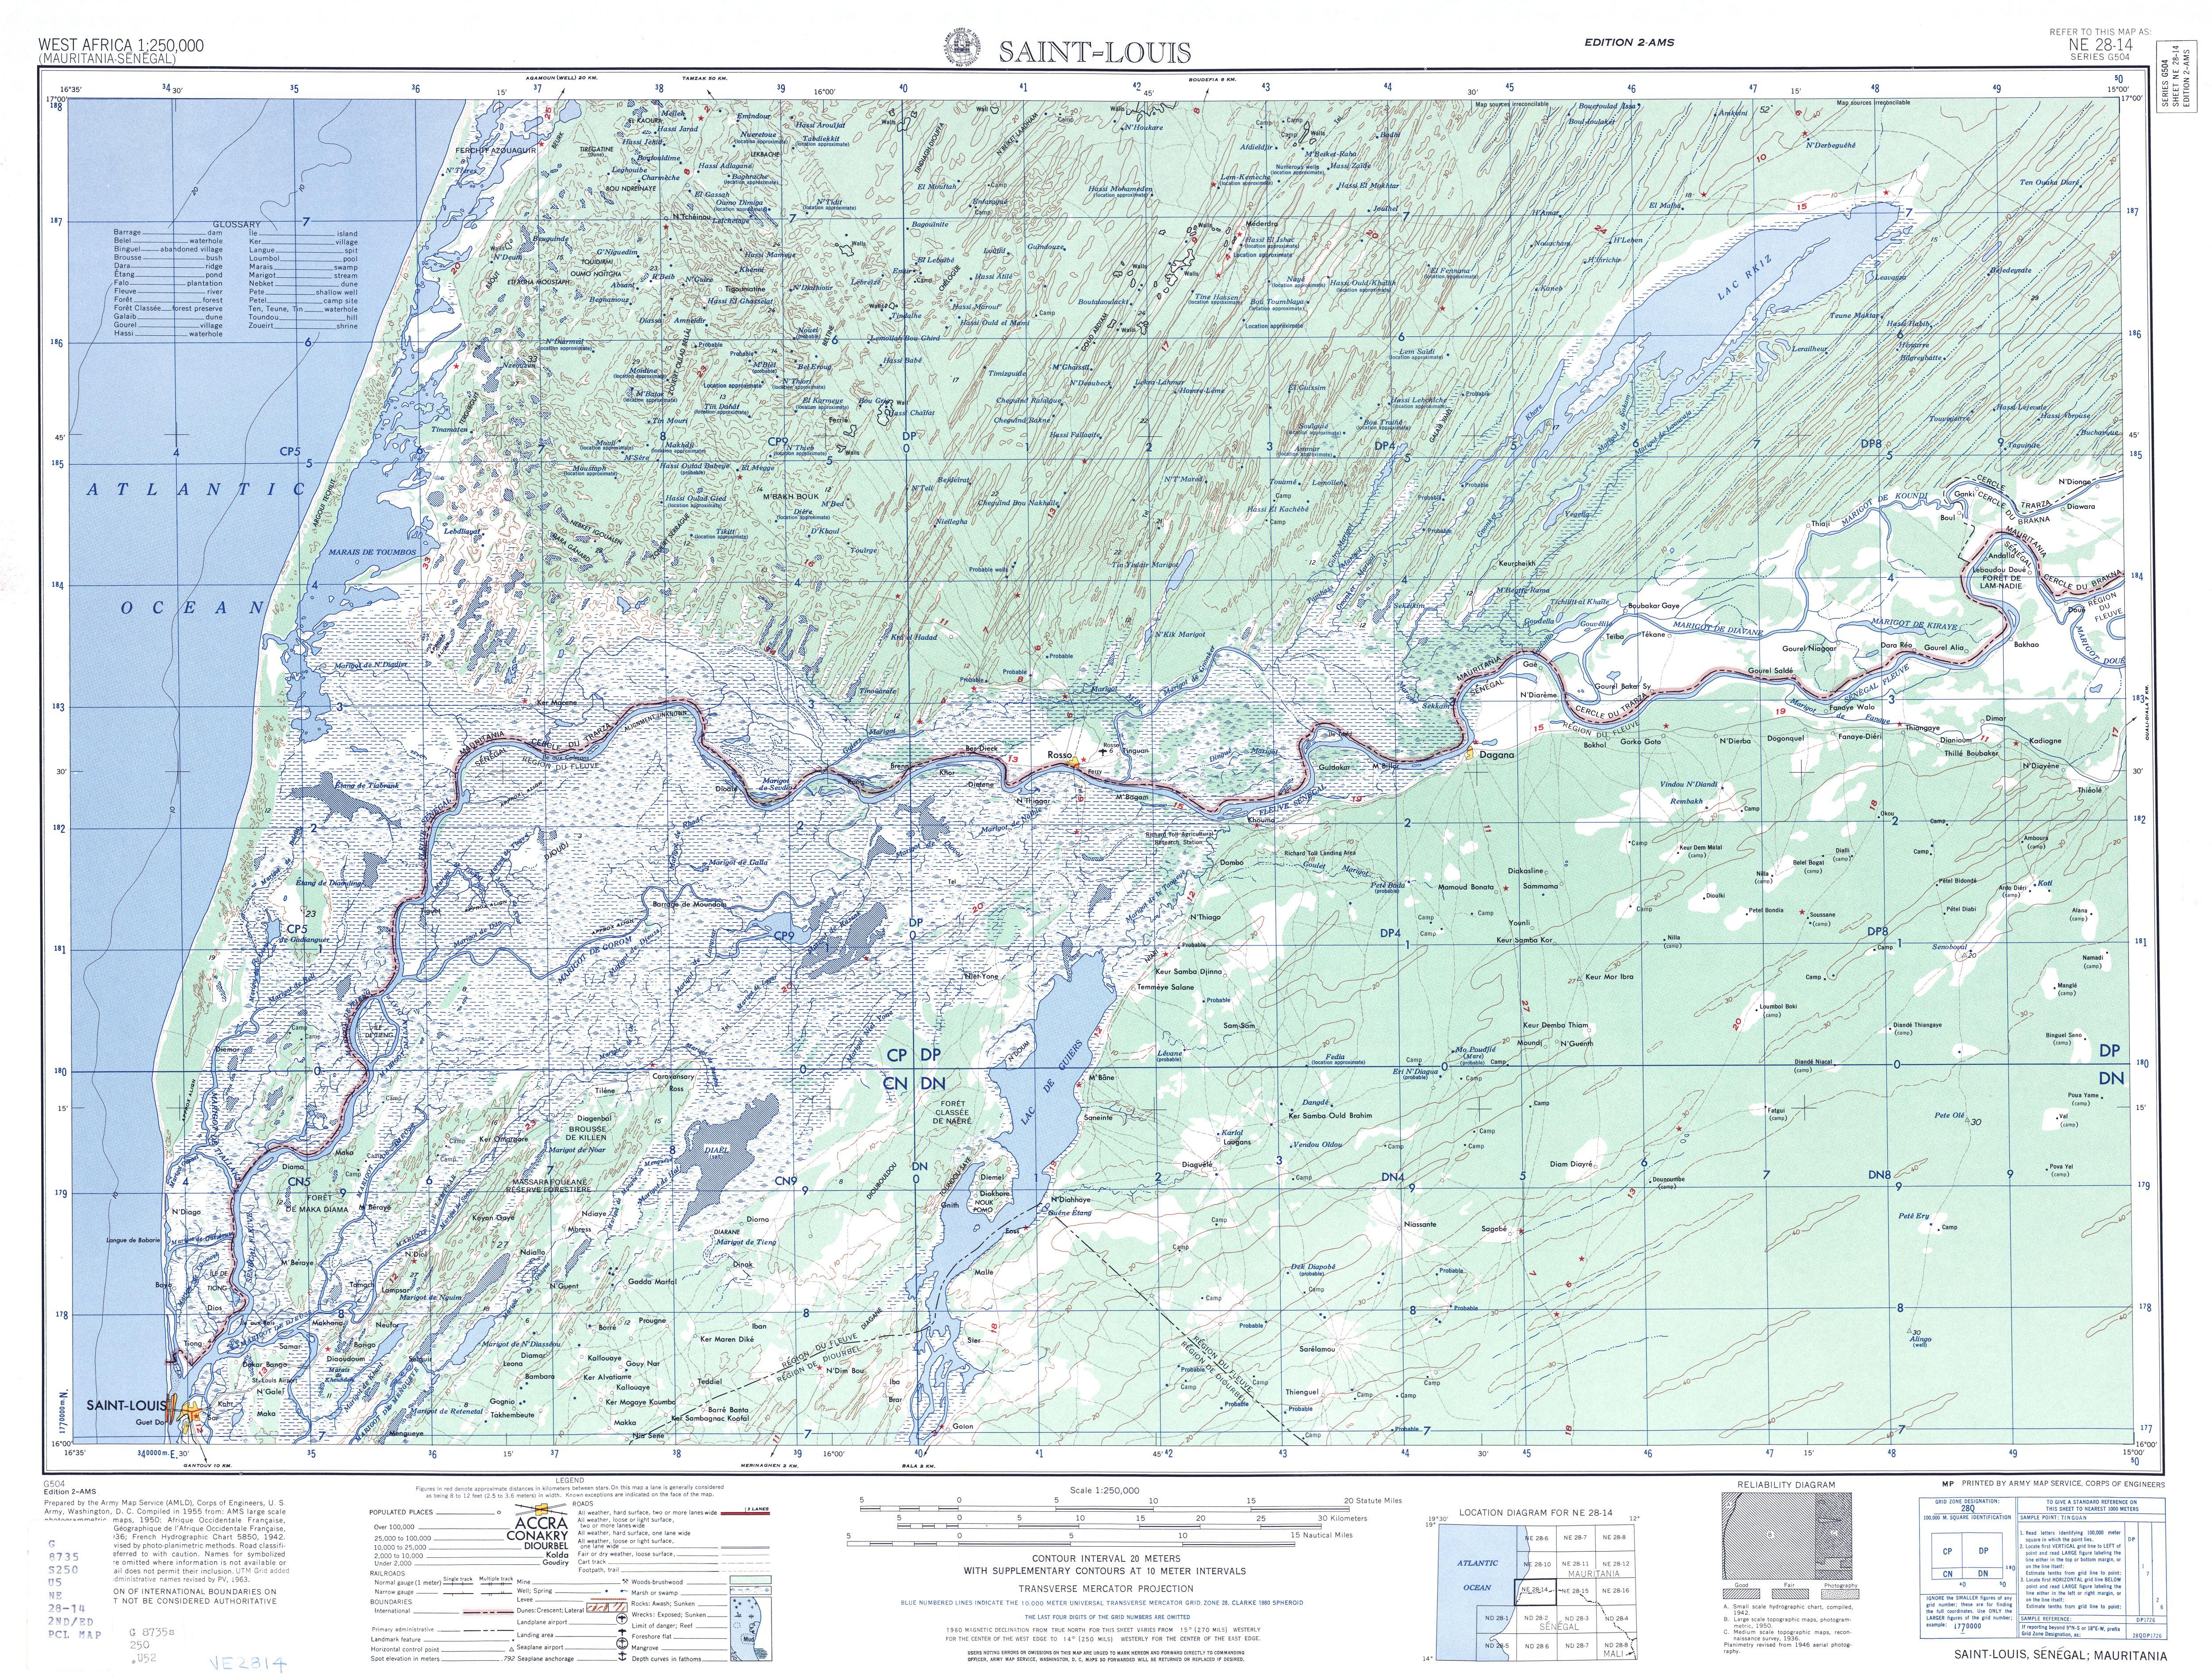 Hoja Saint Louis del Mapa Topográfico de África Occidental 1955